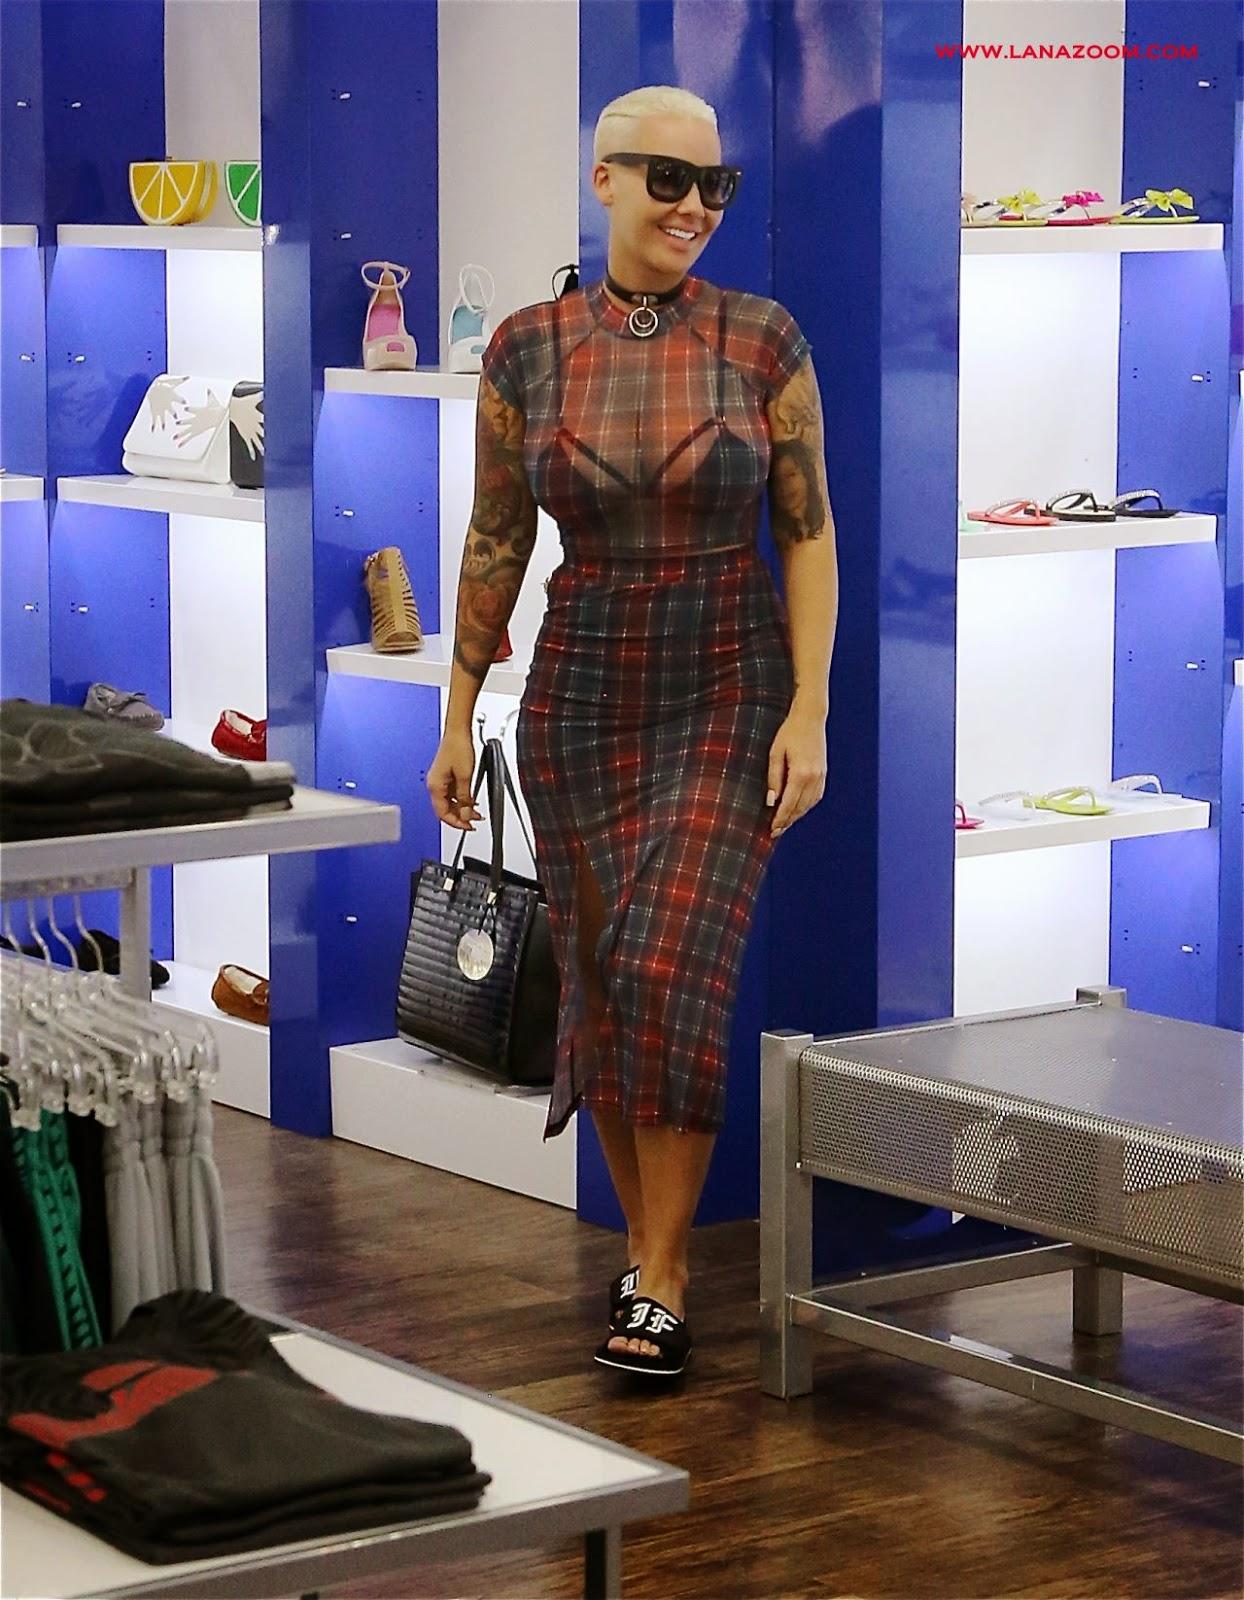 امبر روز تتسوق في لوس انجلوس - أبريل 2015